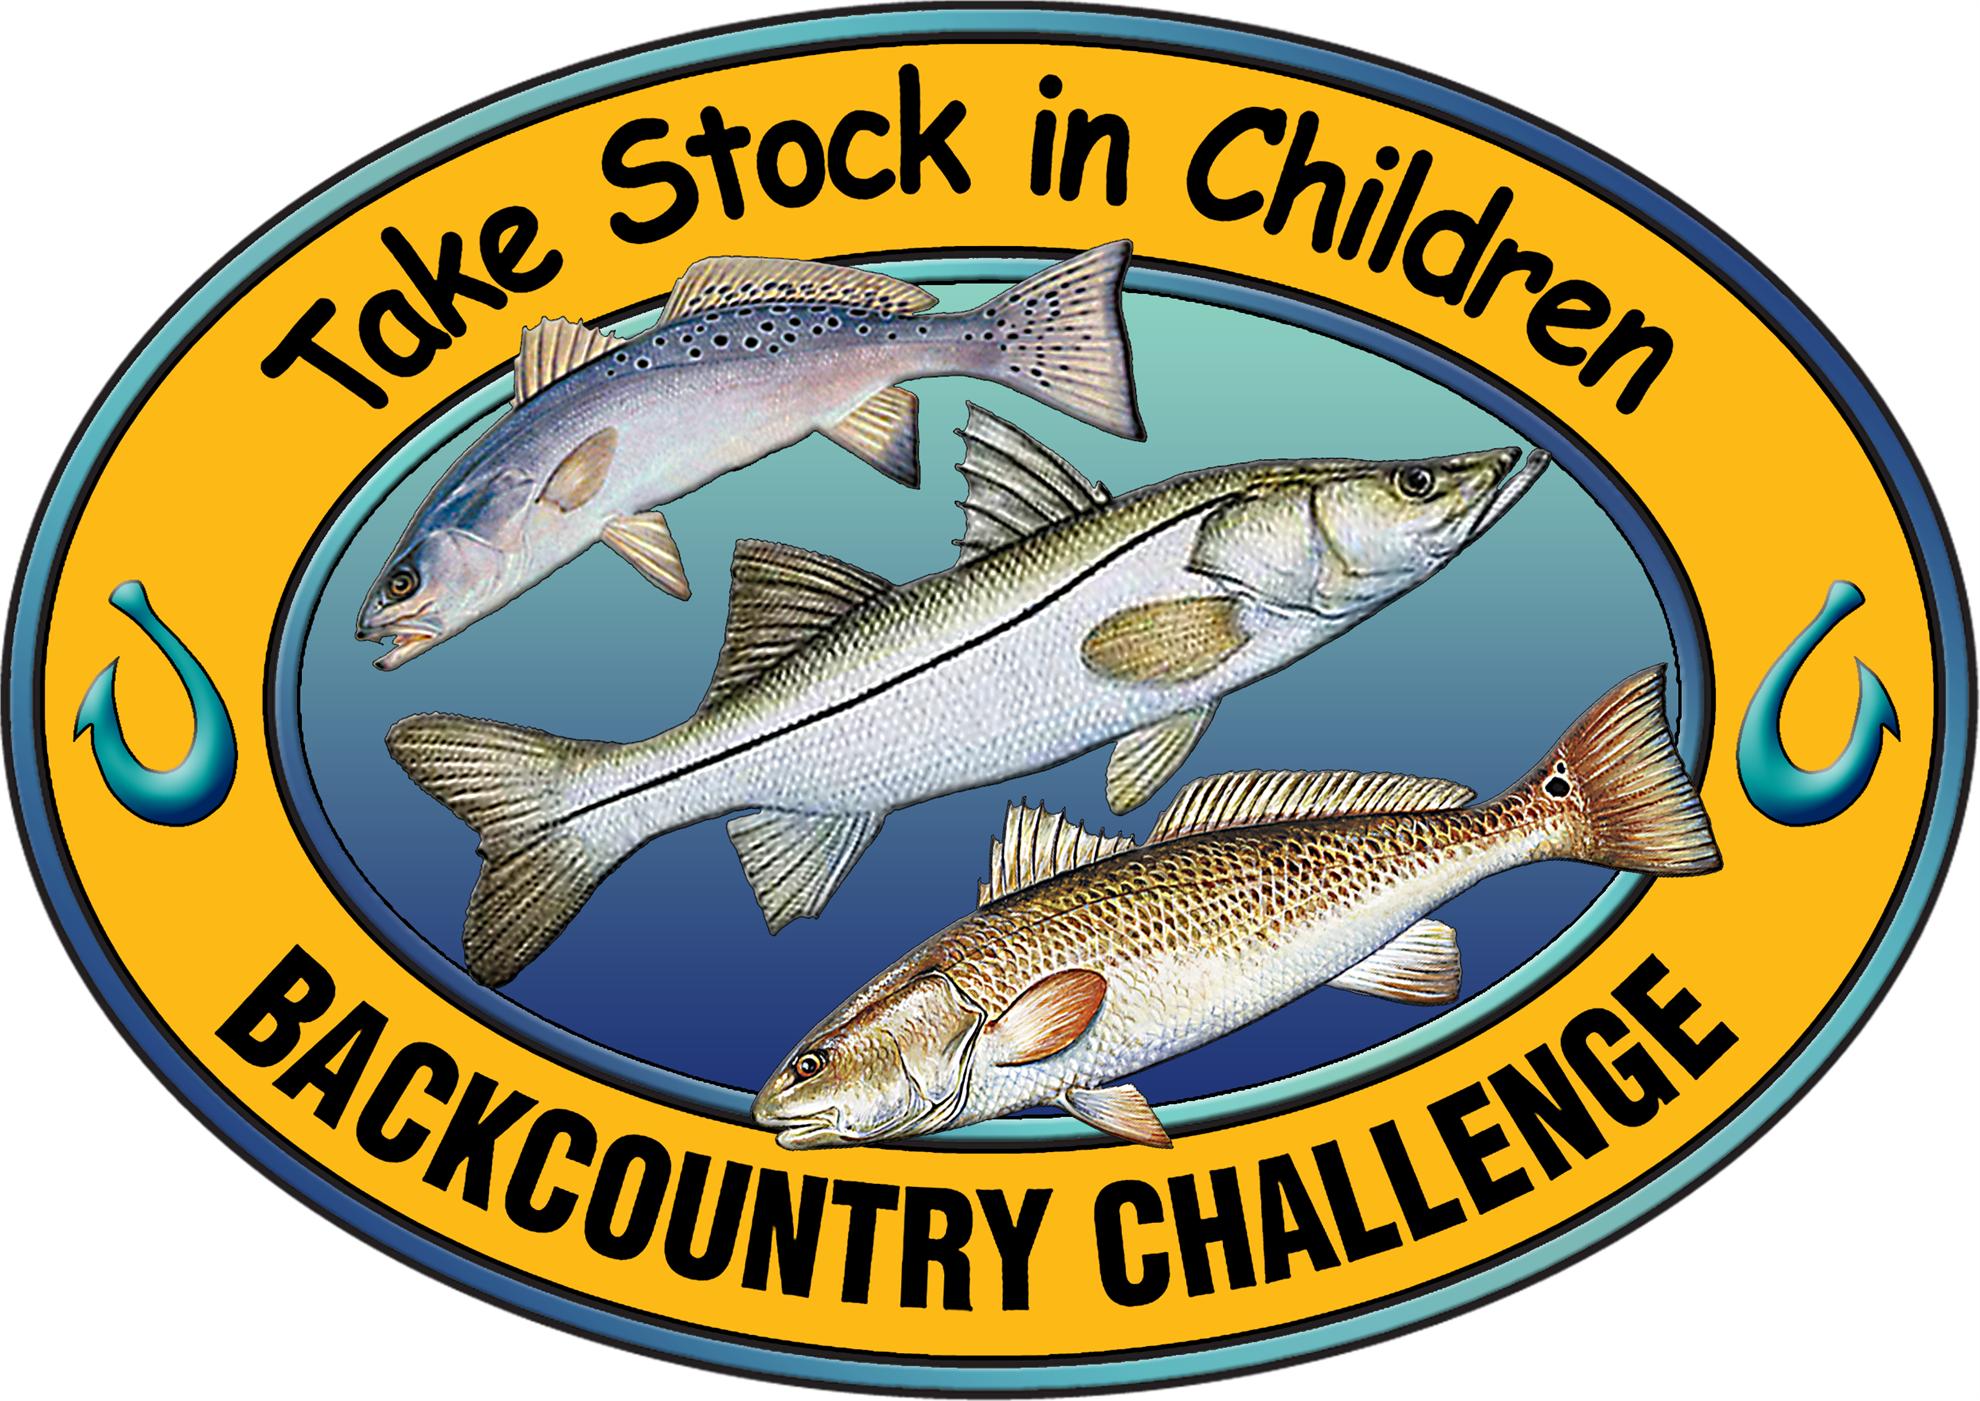 Take Stock in Children Backcountry Challenge